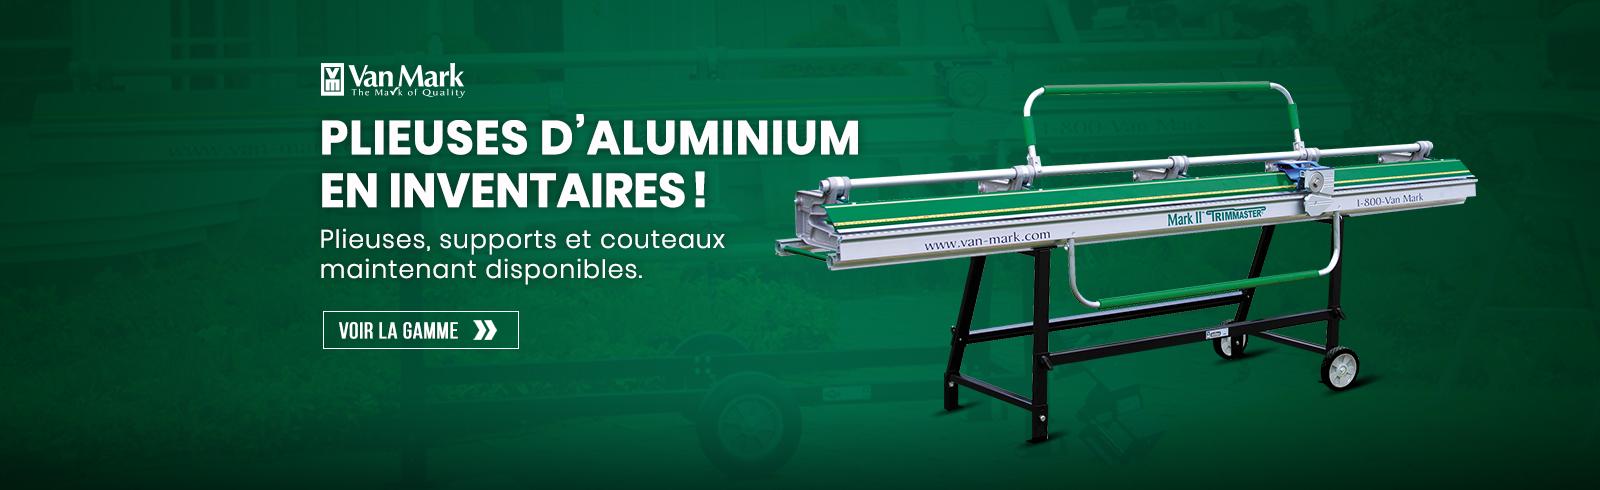 Plieuses d'aluminium en inventaires!